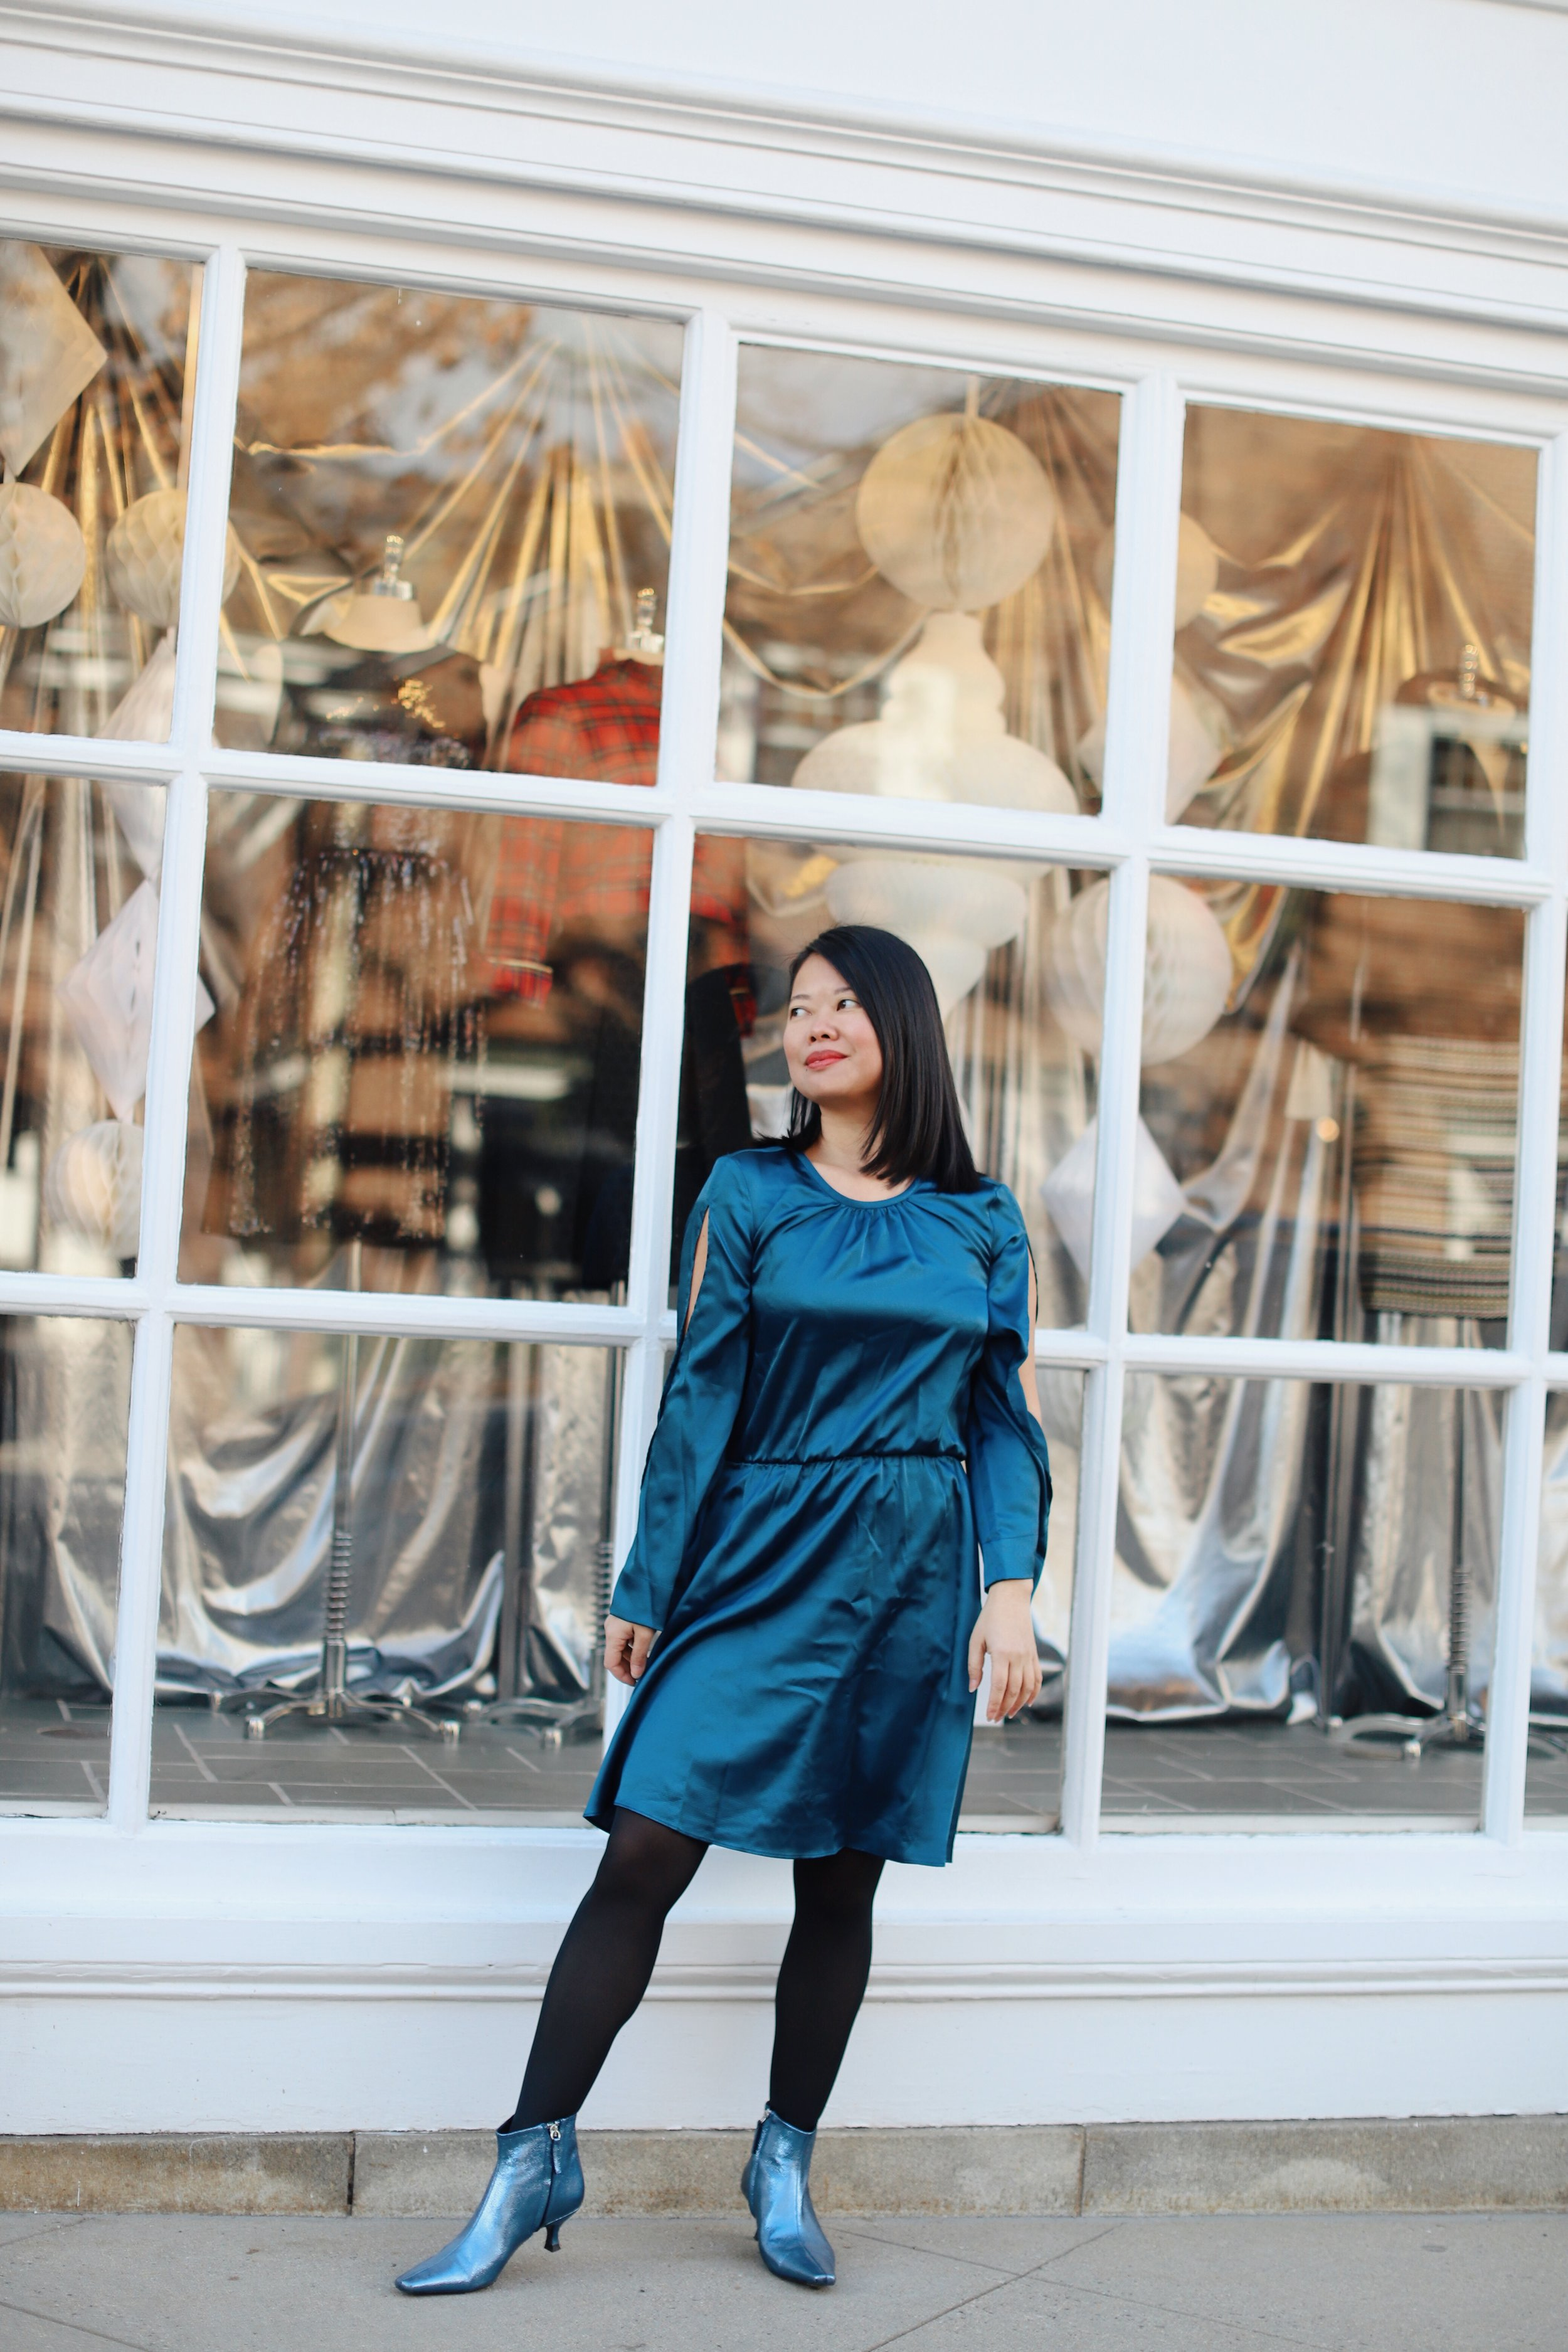 Wearing   Rachel Roy   dress from   T.J.Maxx  , Zara metallic booties (old, similar   here  ),   Rachel Zoe   tuxedo jacket from   Macy's   (similar   here  ), DVF wool coat from Nordstrom Rack (old)